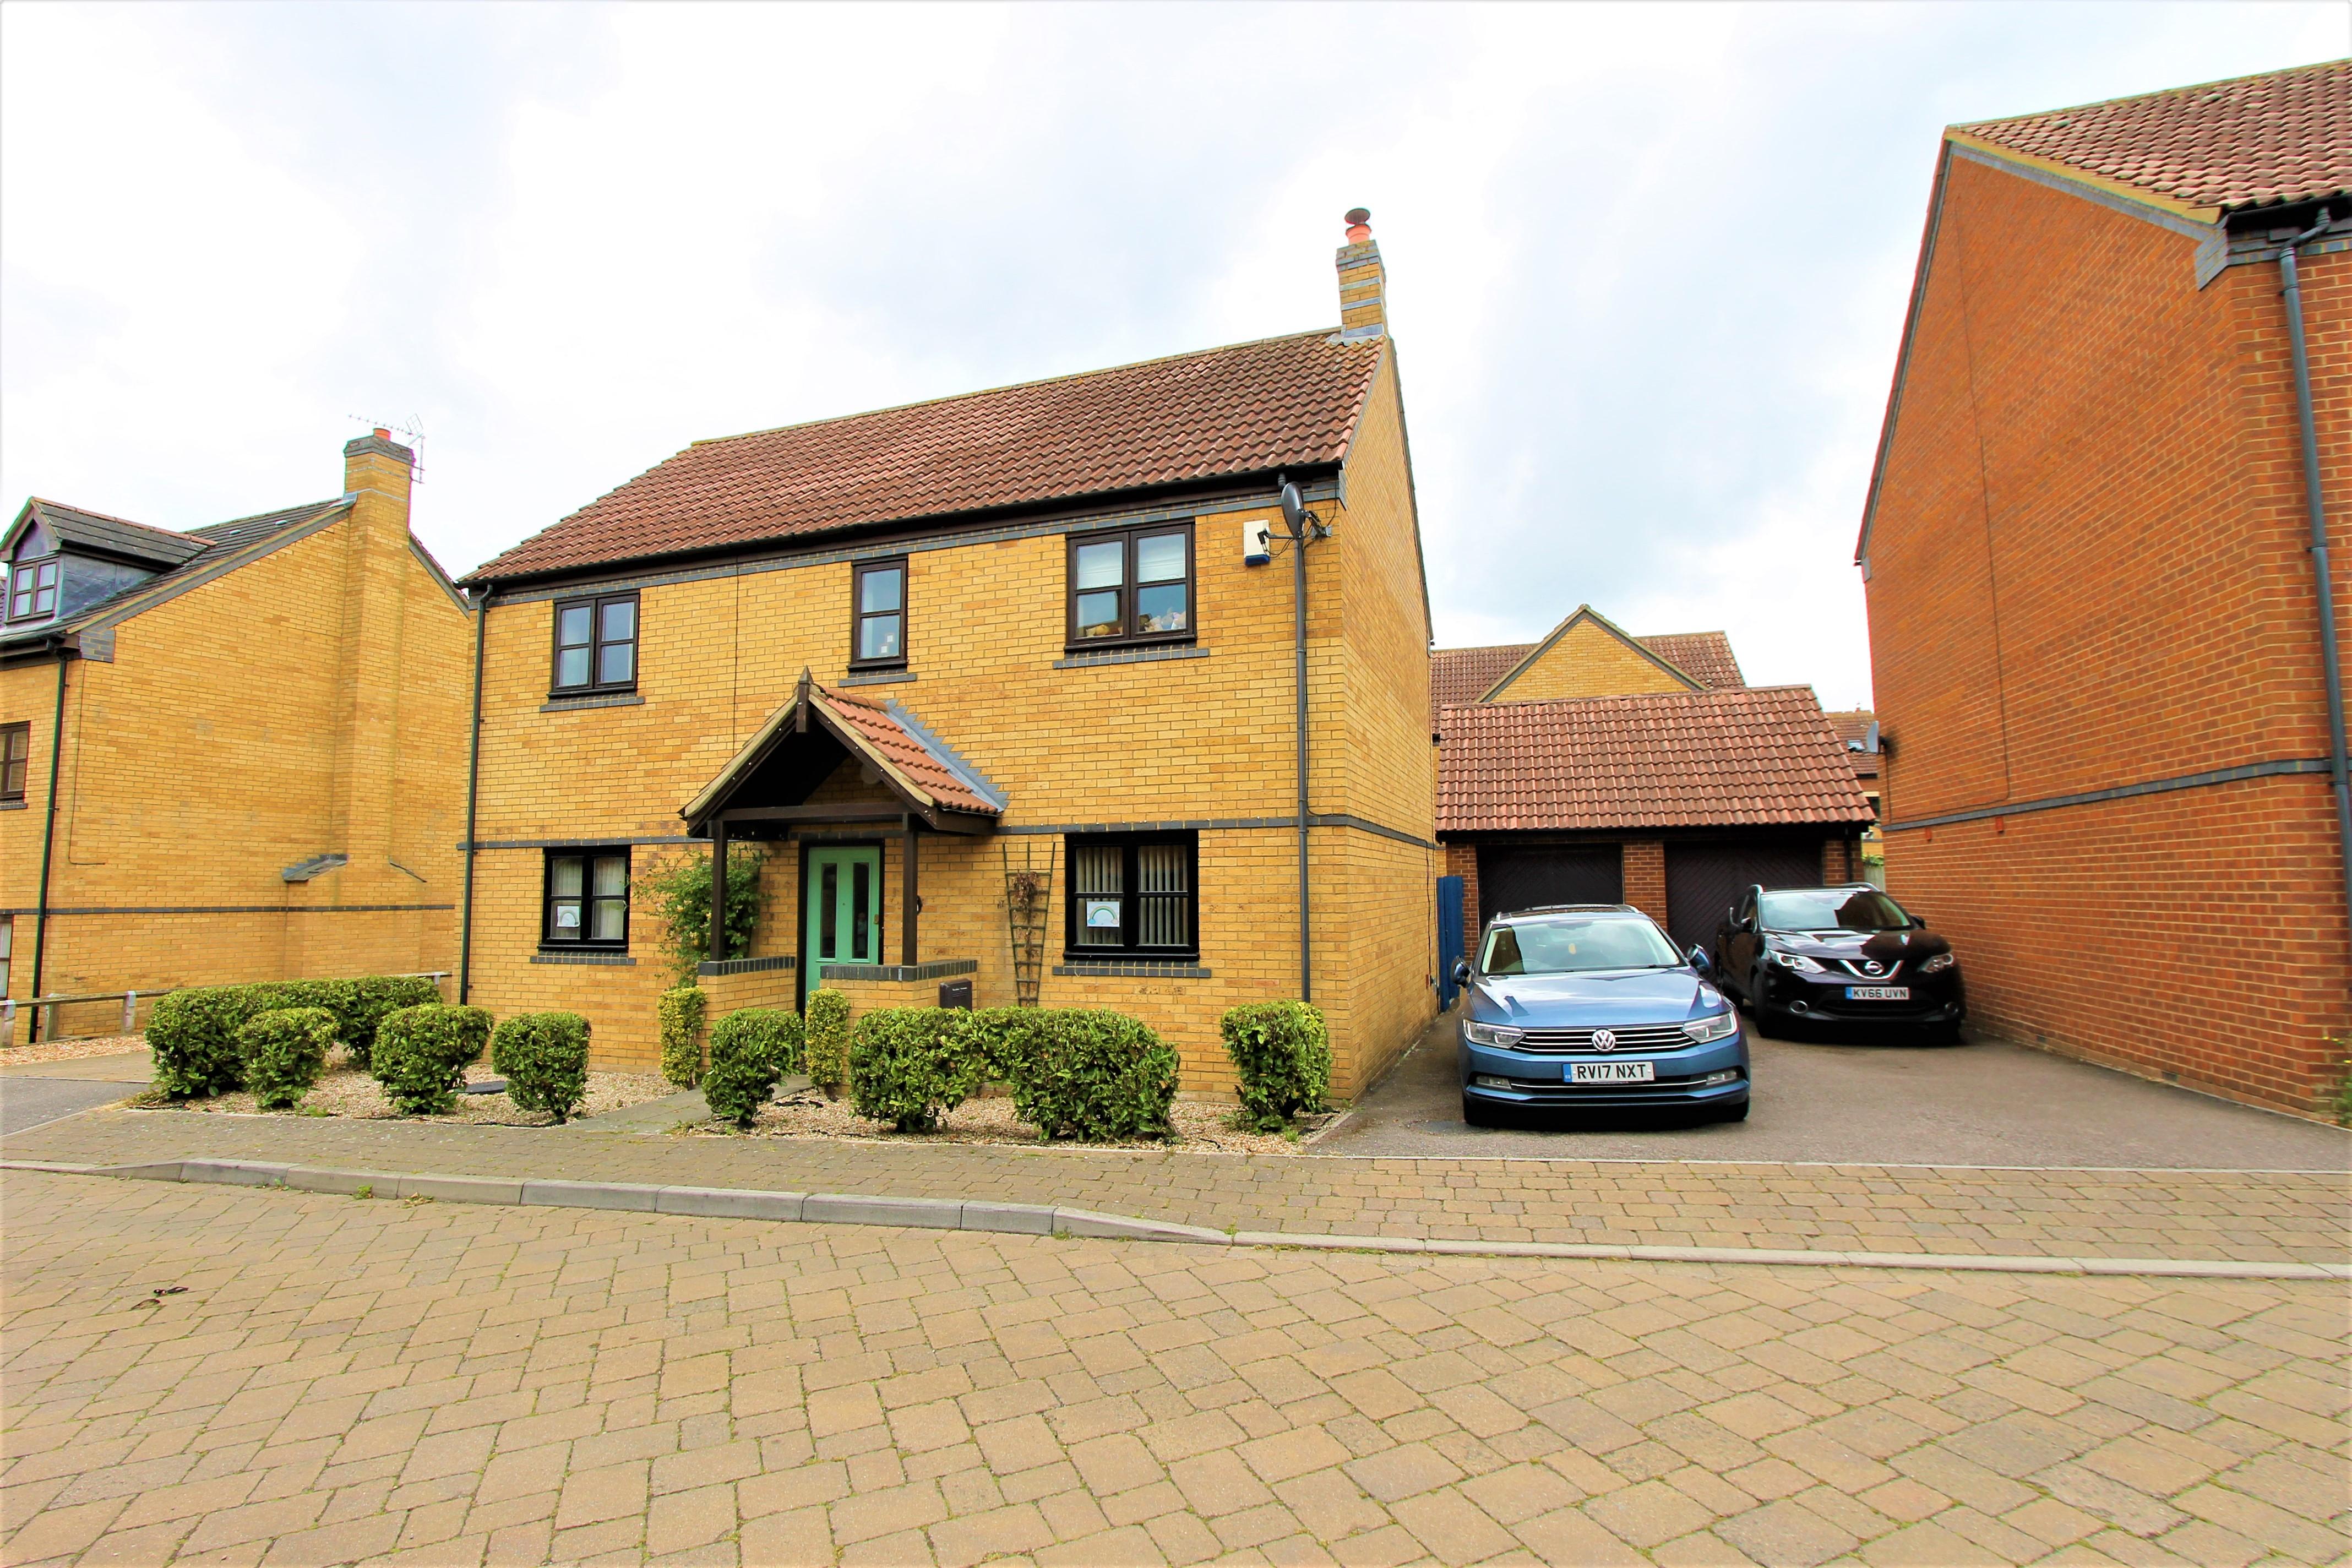 Gainsborough Close, Milton Keynes, Buckinghamshire Image